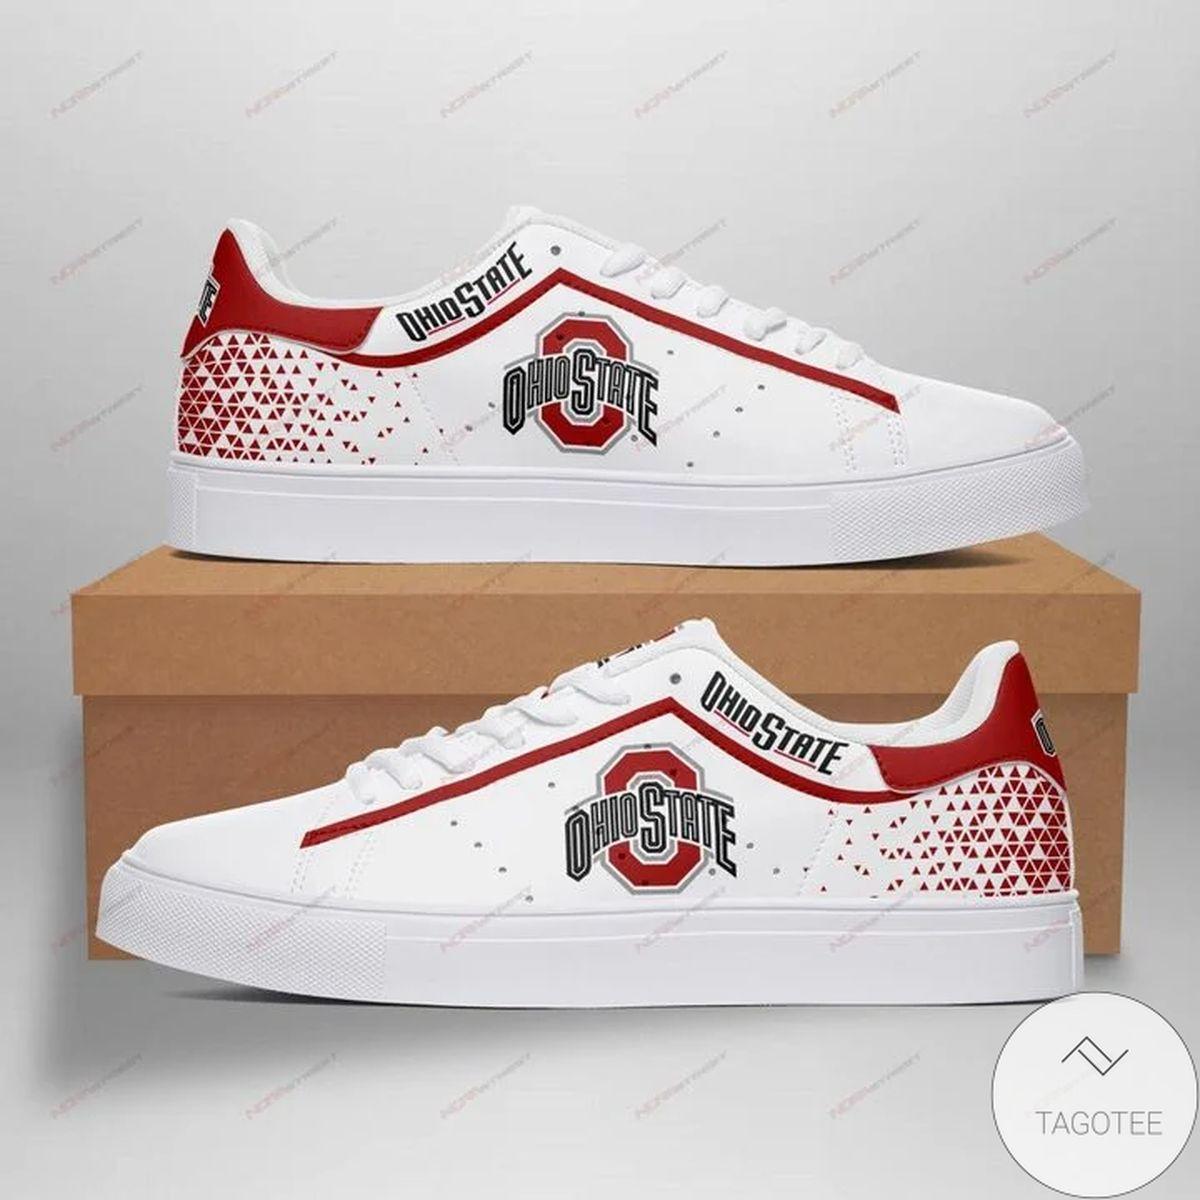 Ncaa Ohio State Buckeyes Stan Smith Shoes